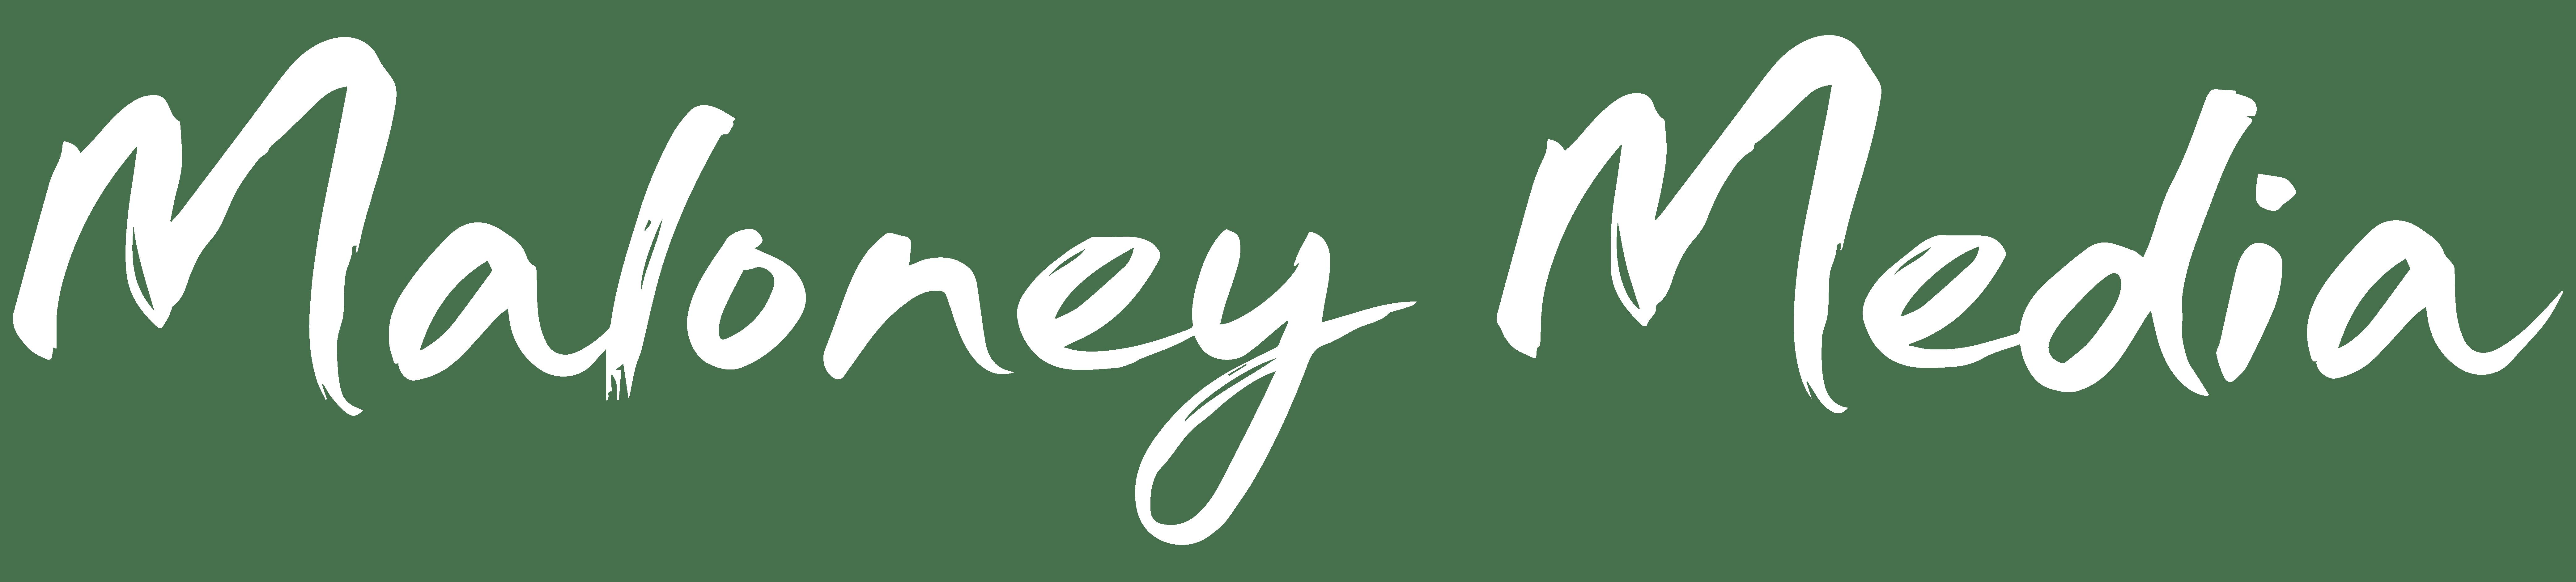 Maloney Media | Internet Marketing Experts